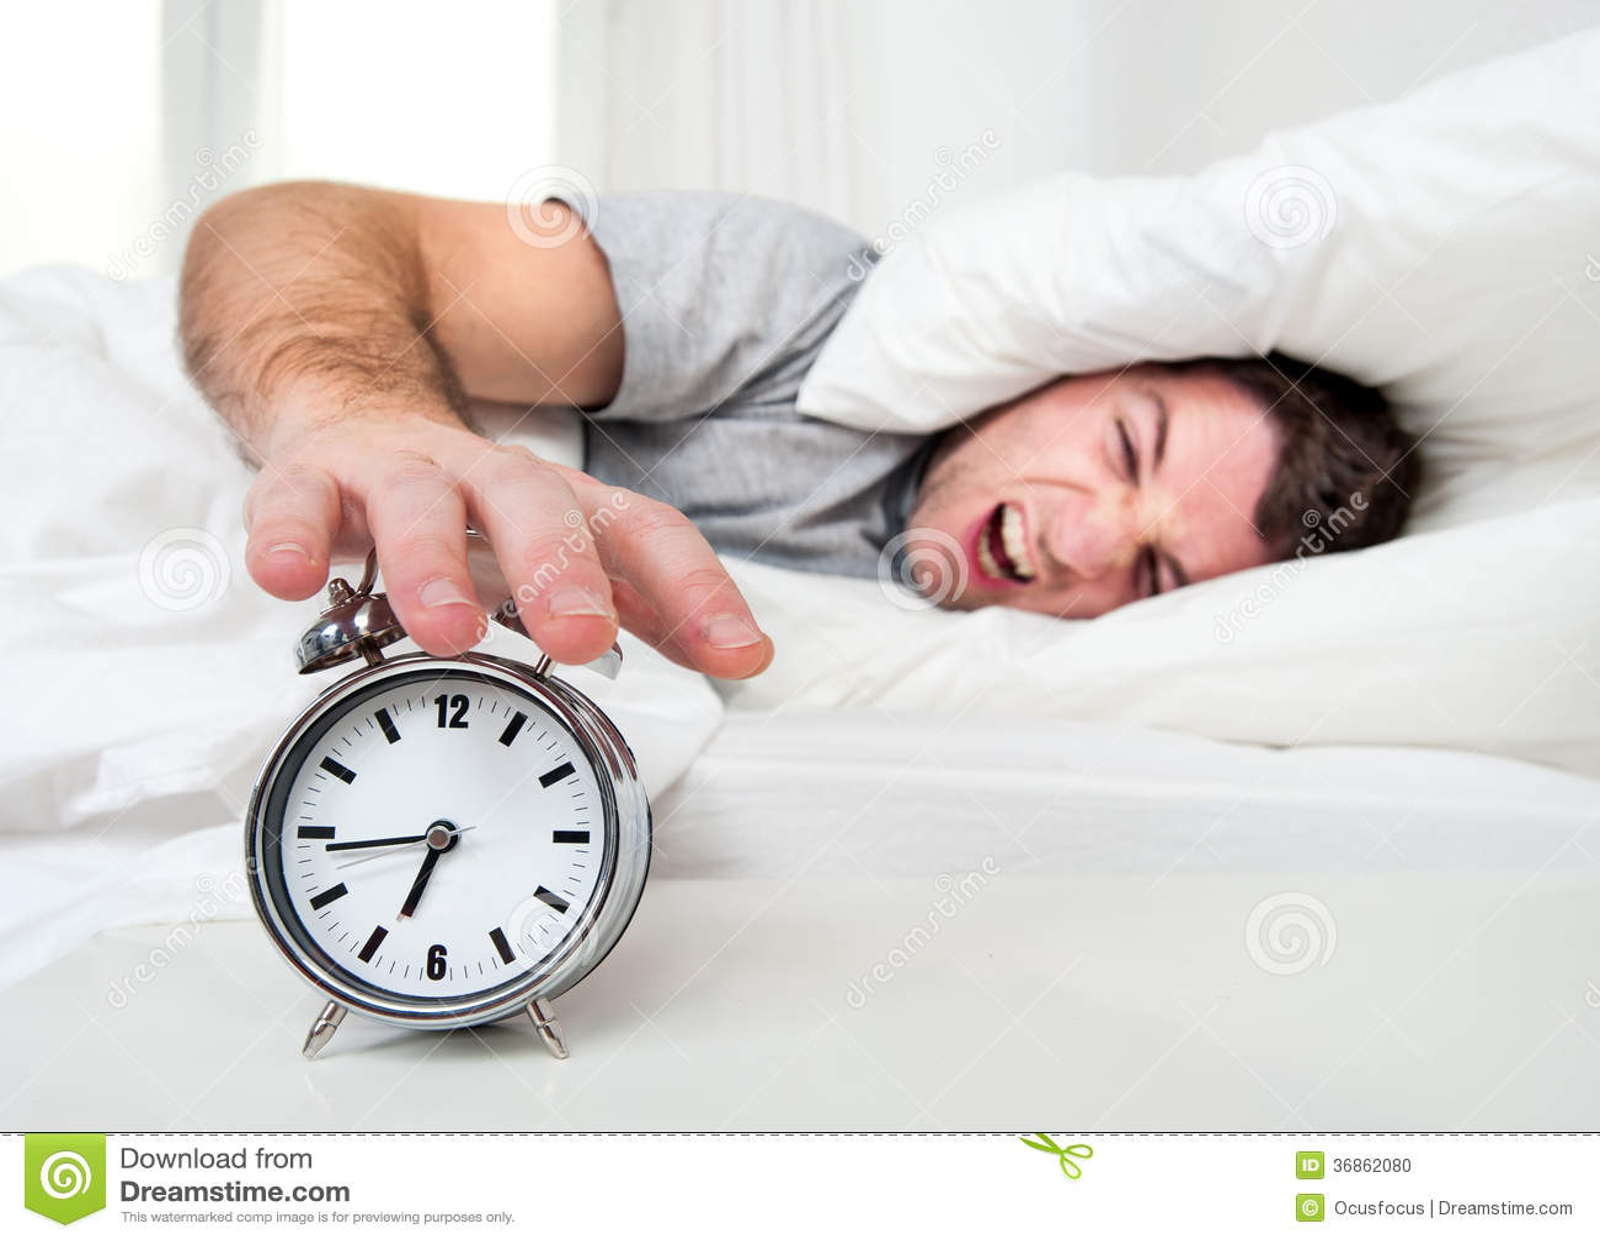 Disturbed Bed Sleep